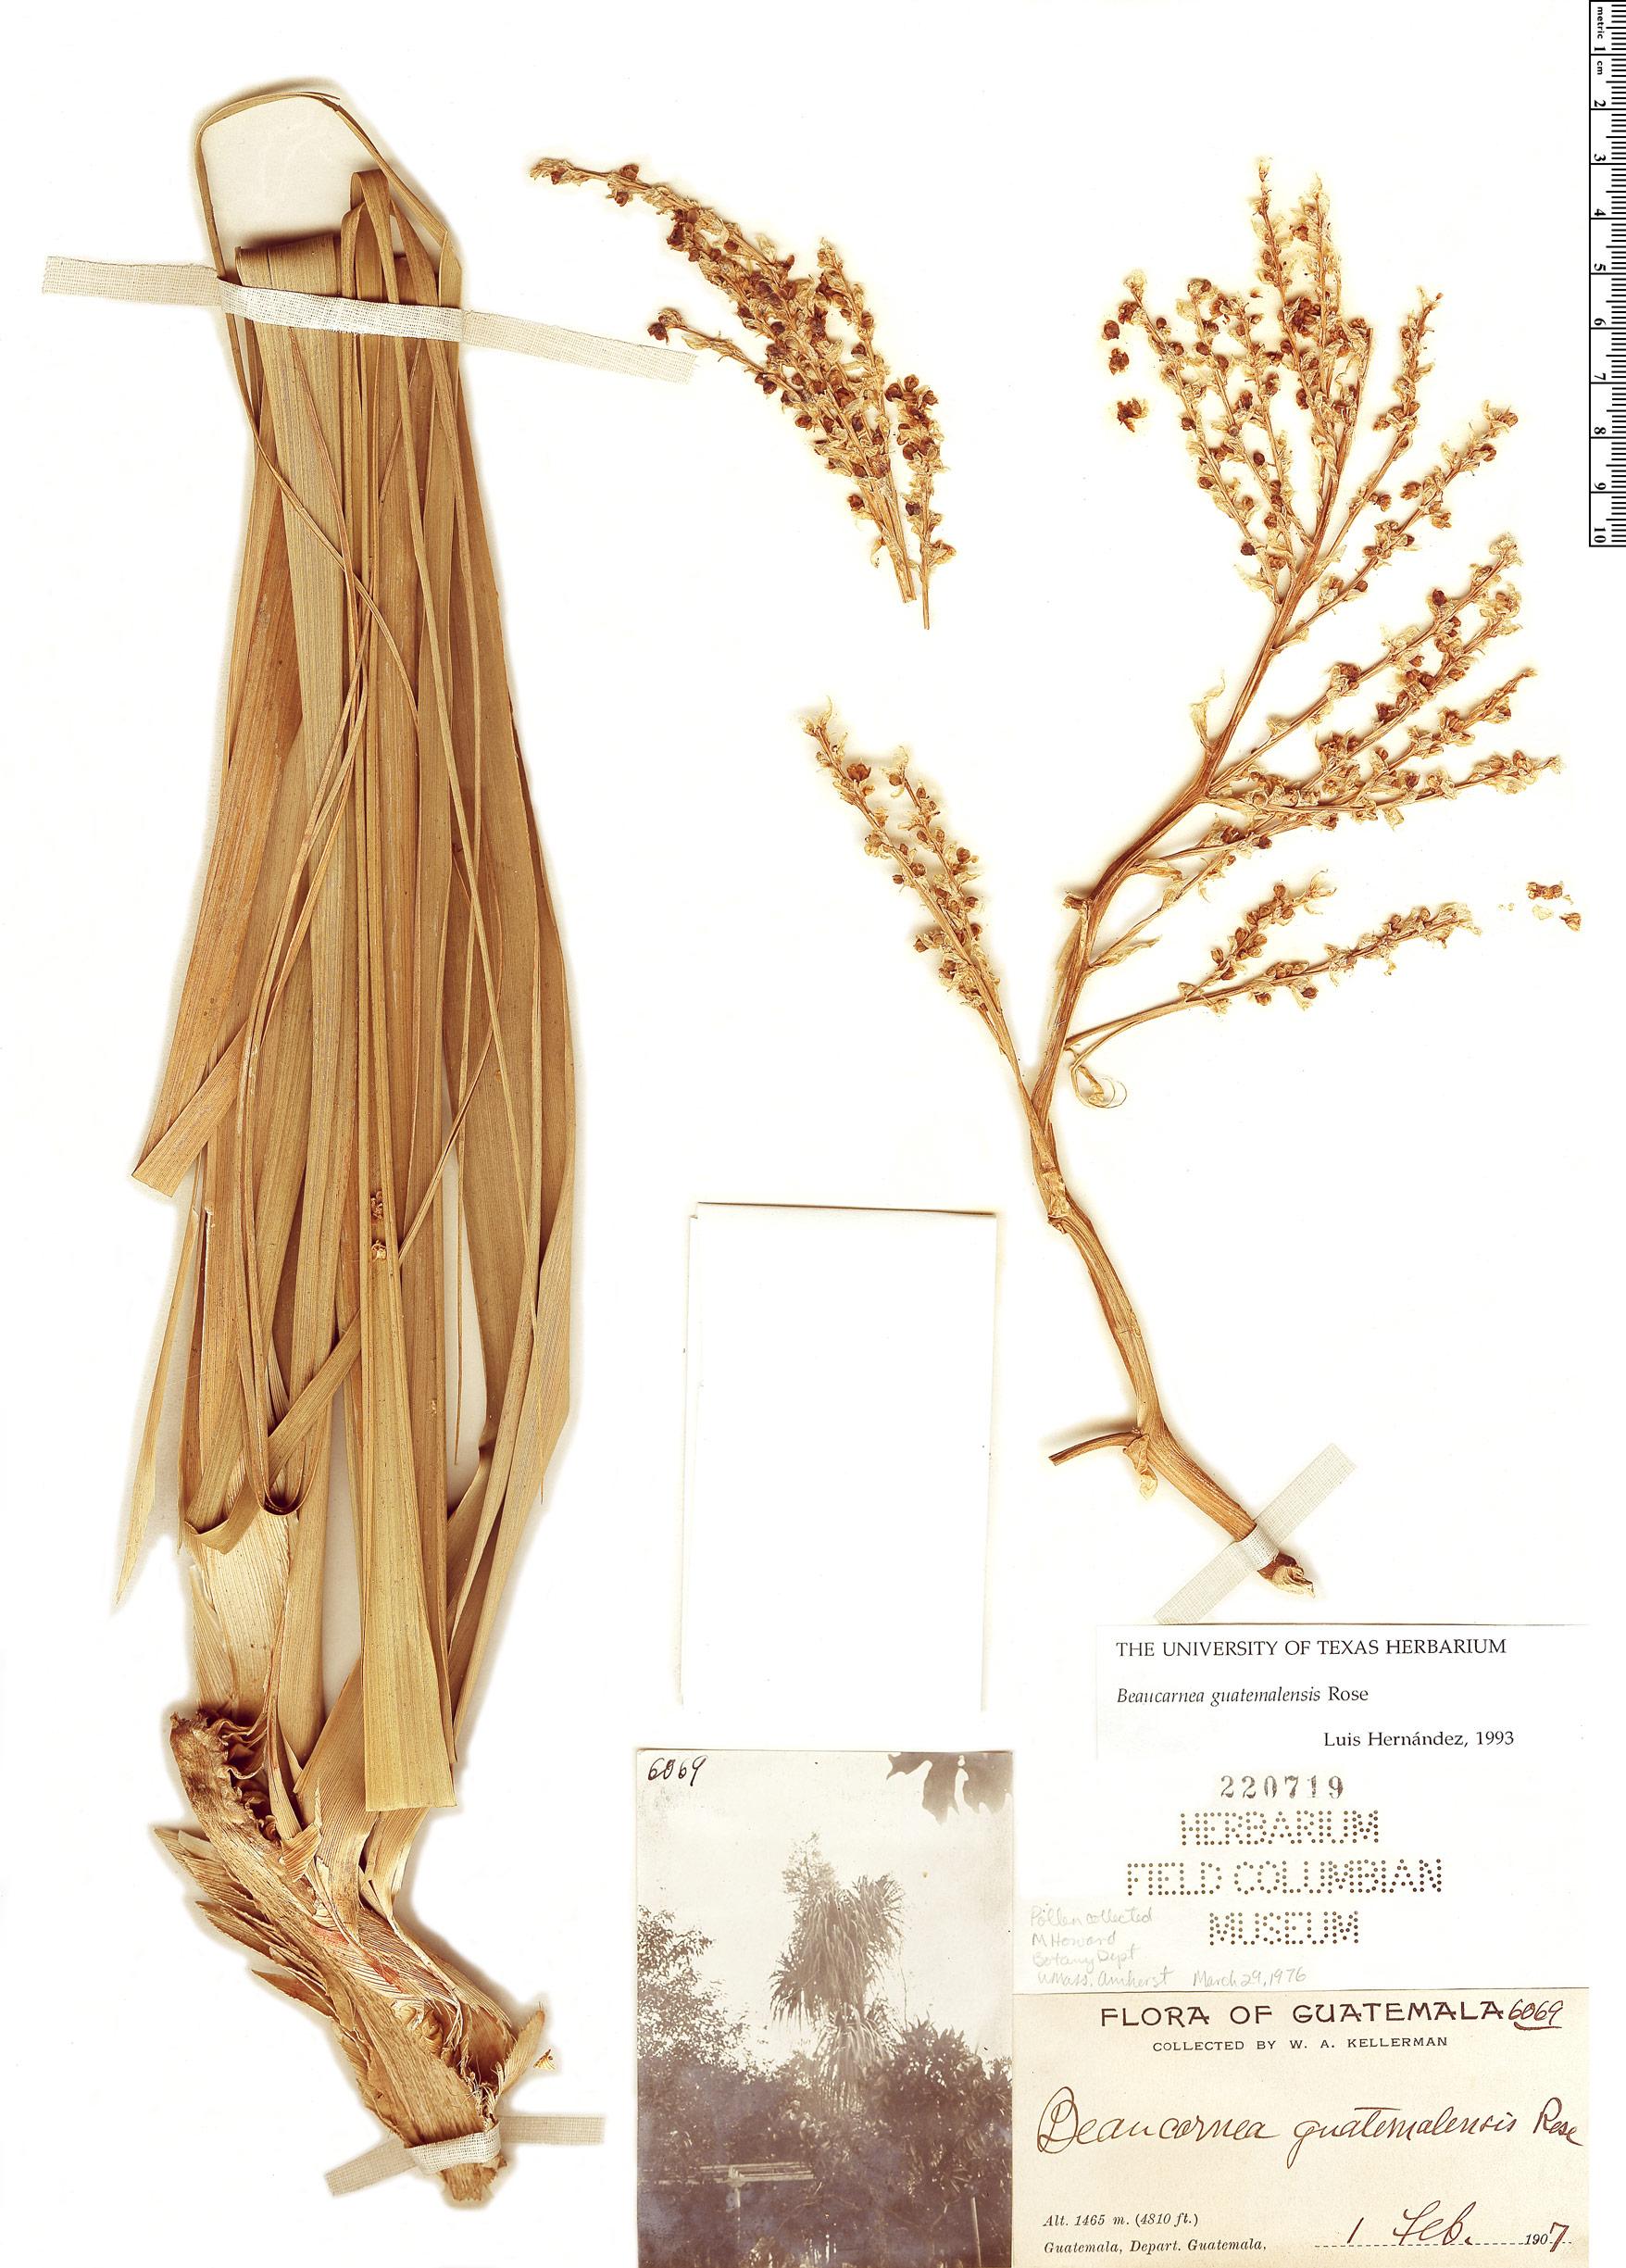 Specimen: Beaucarnea guatemalensis